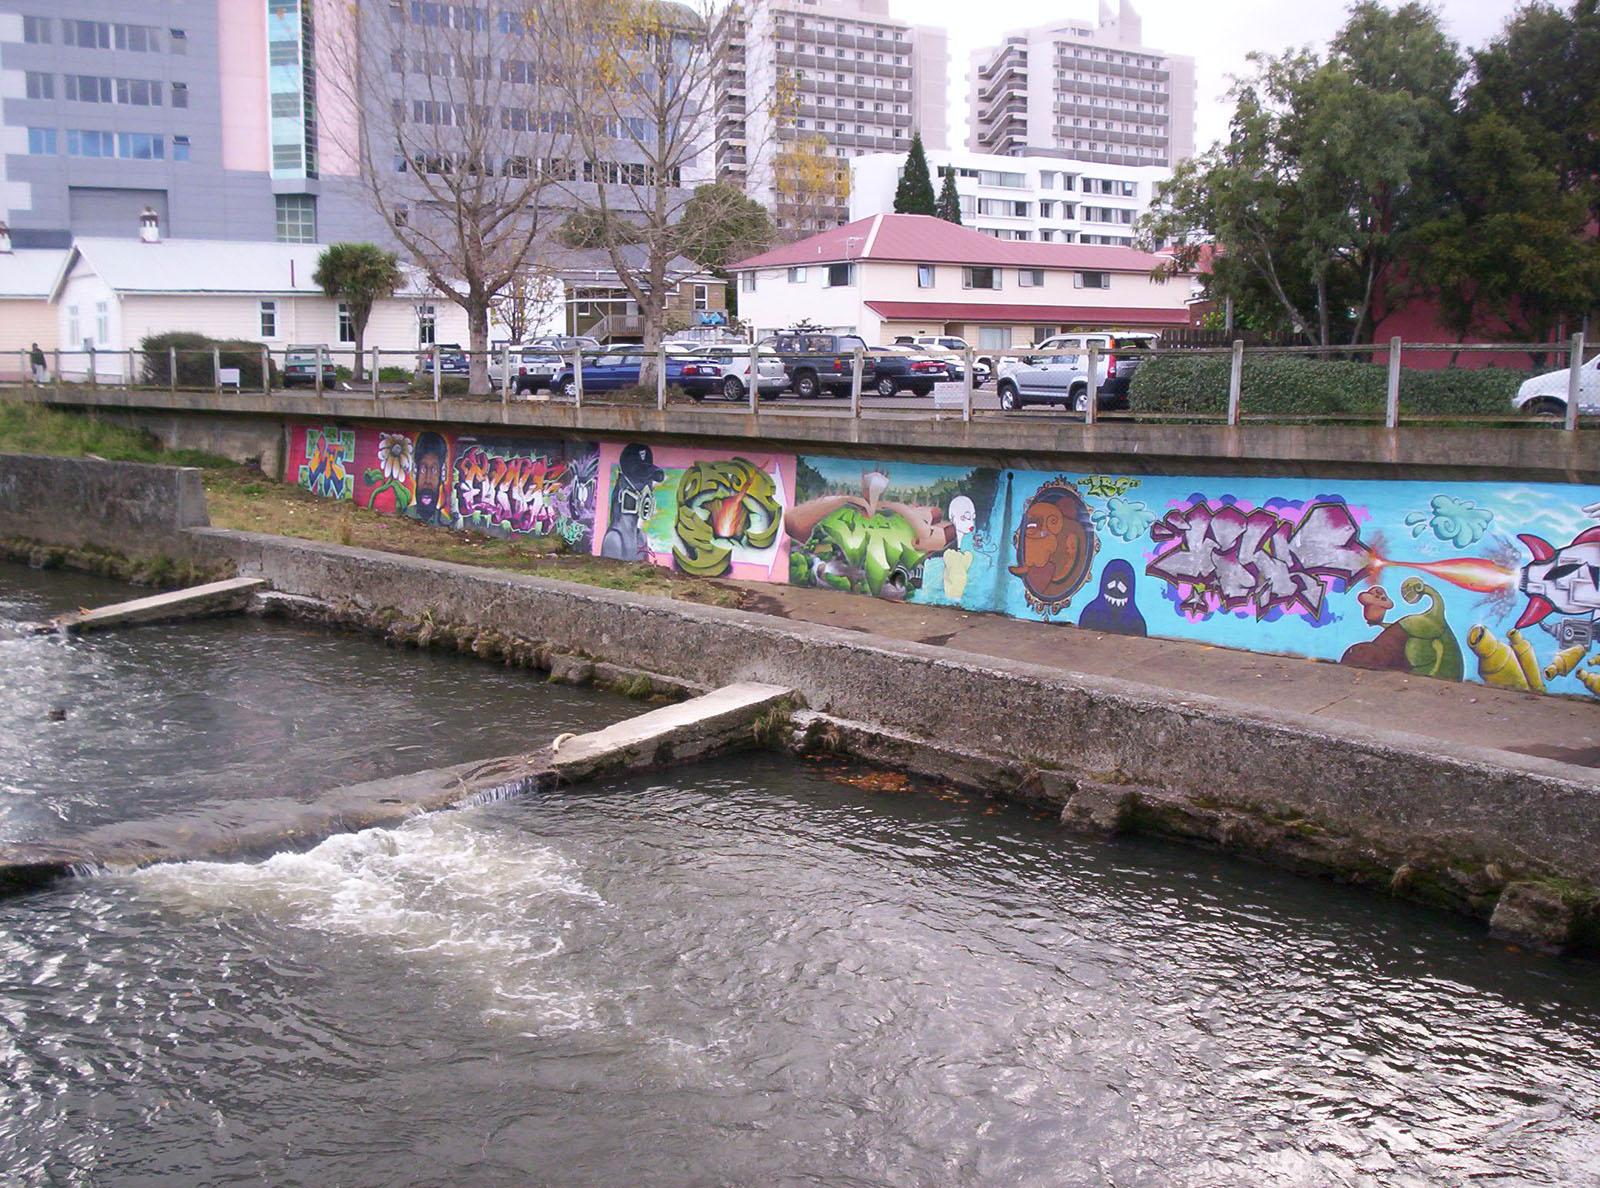 Leithbank Extension, Bspo06, Commerce, Dunedin, Graffiti, HQ Photo